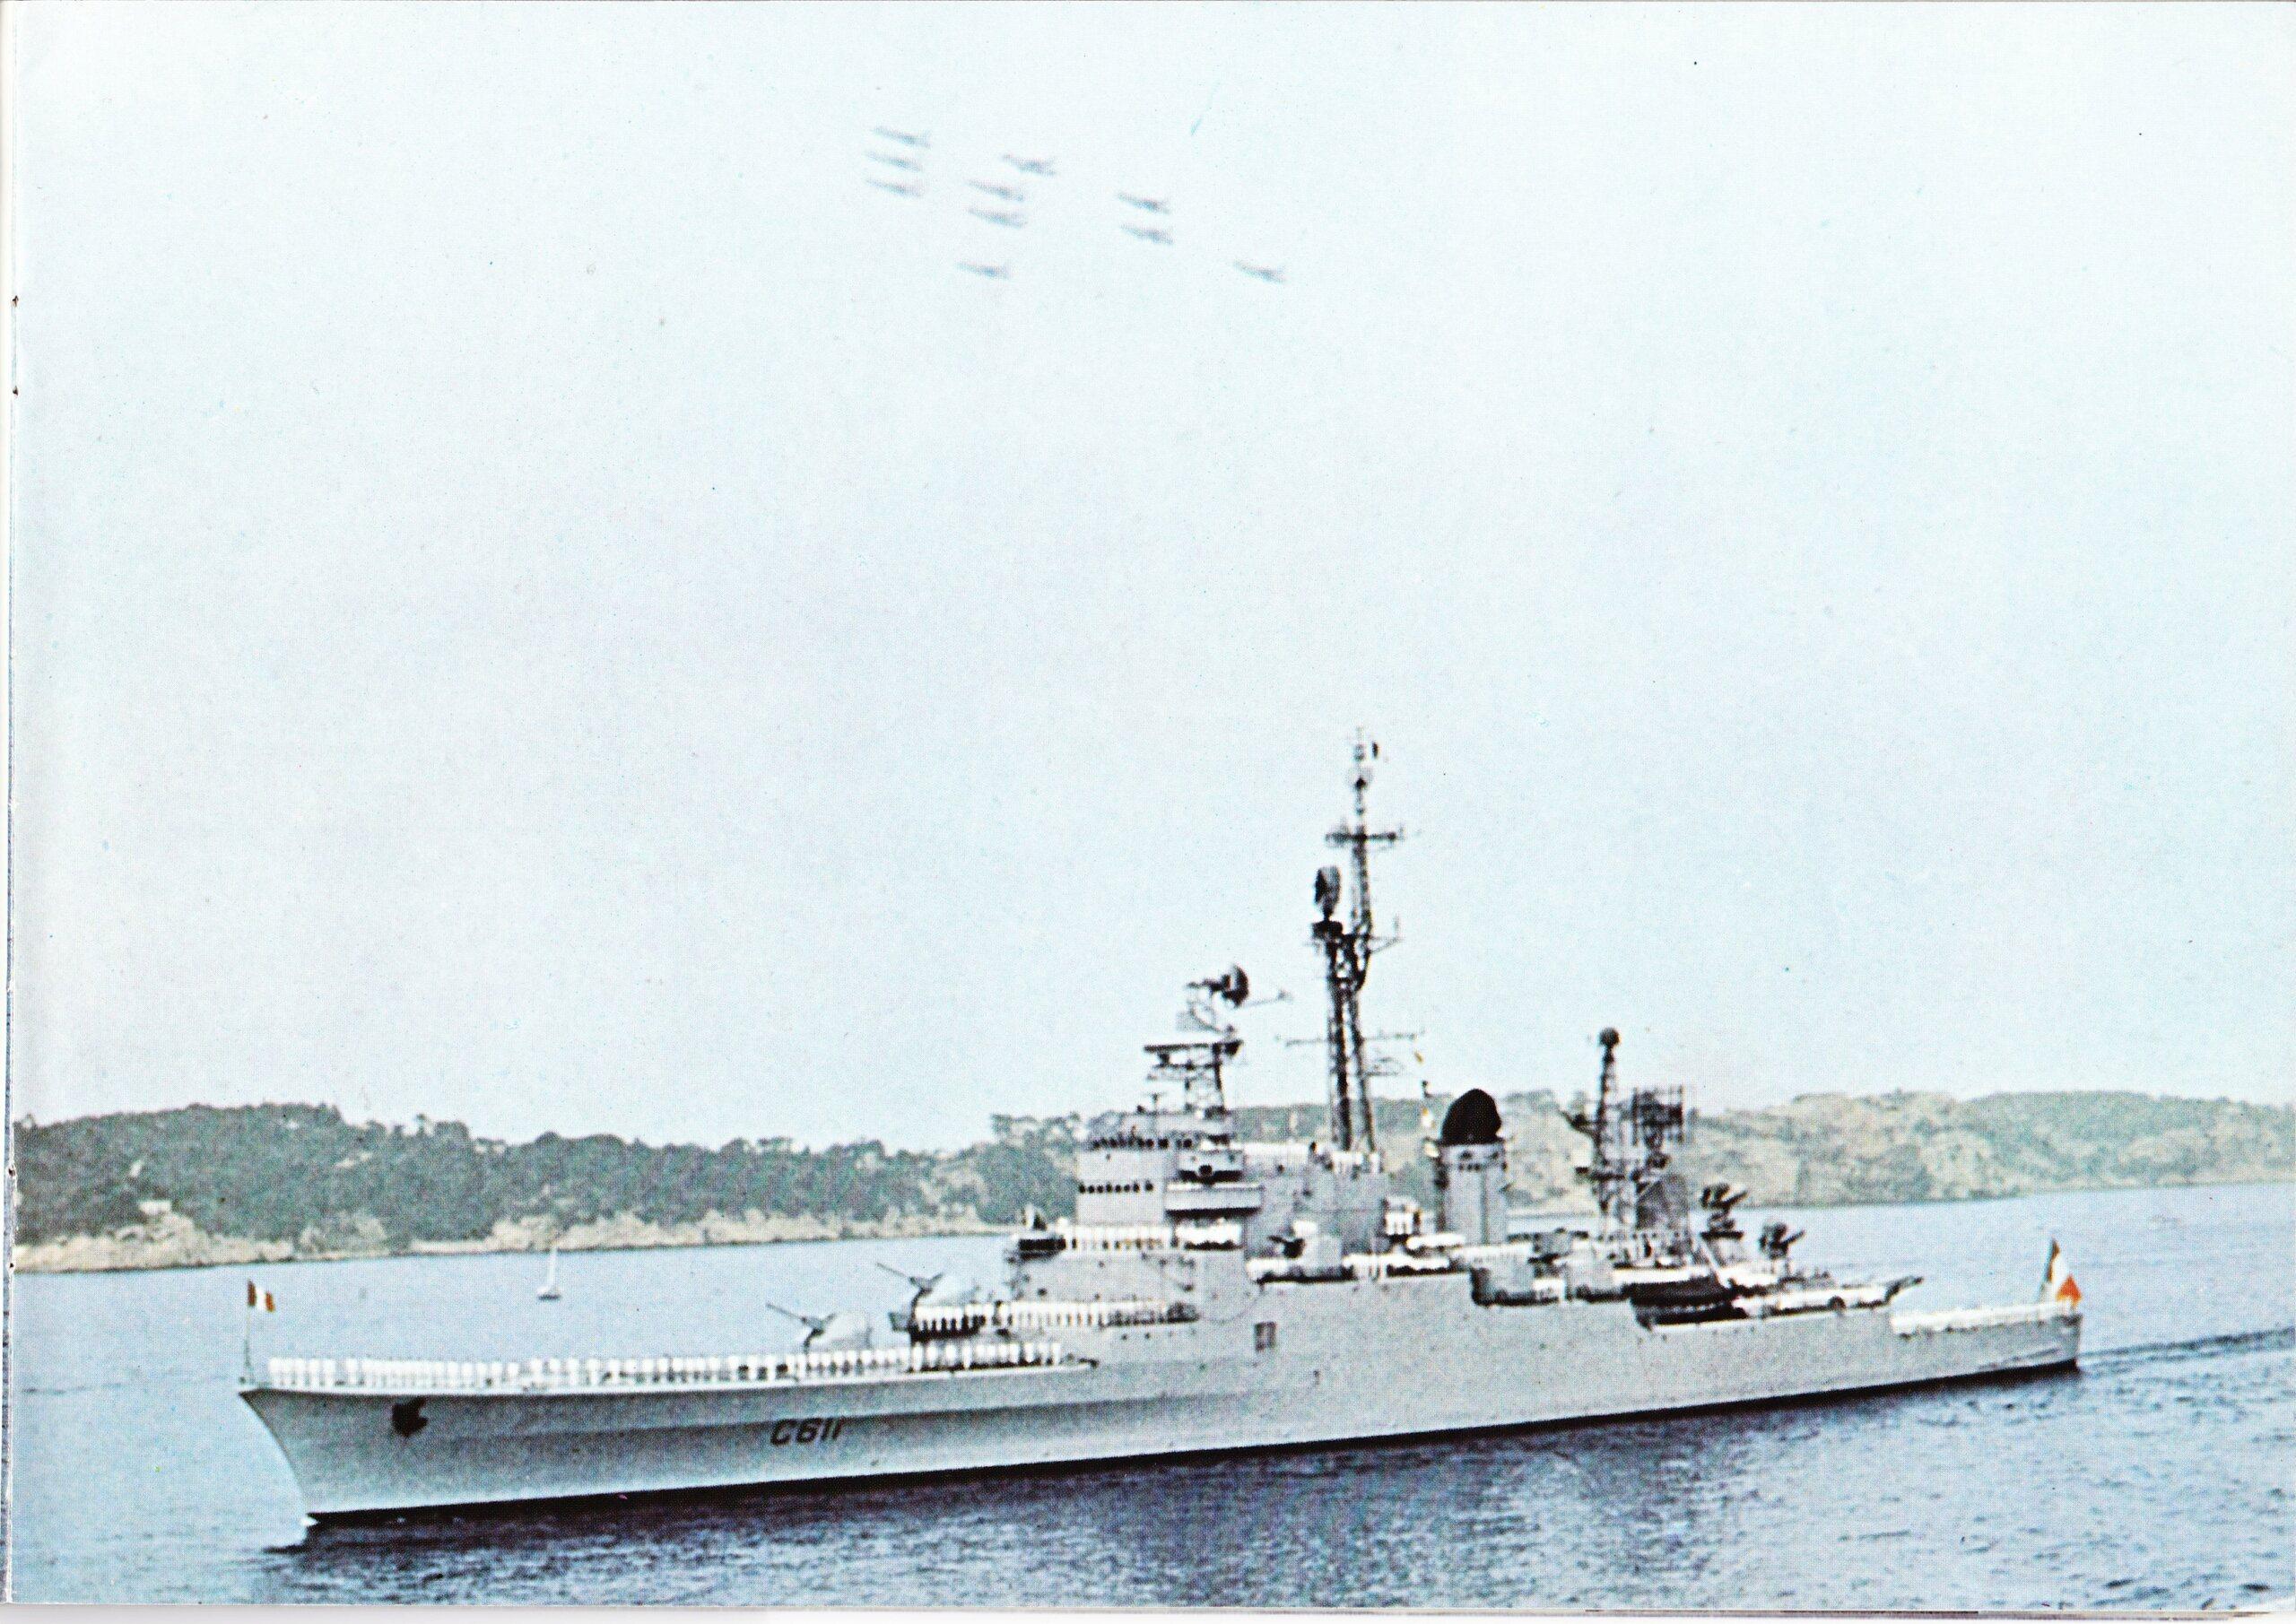 La marine de VGE - Page 2 Img_0038